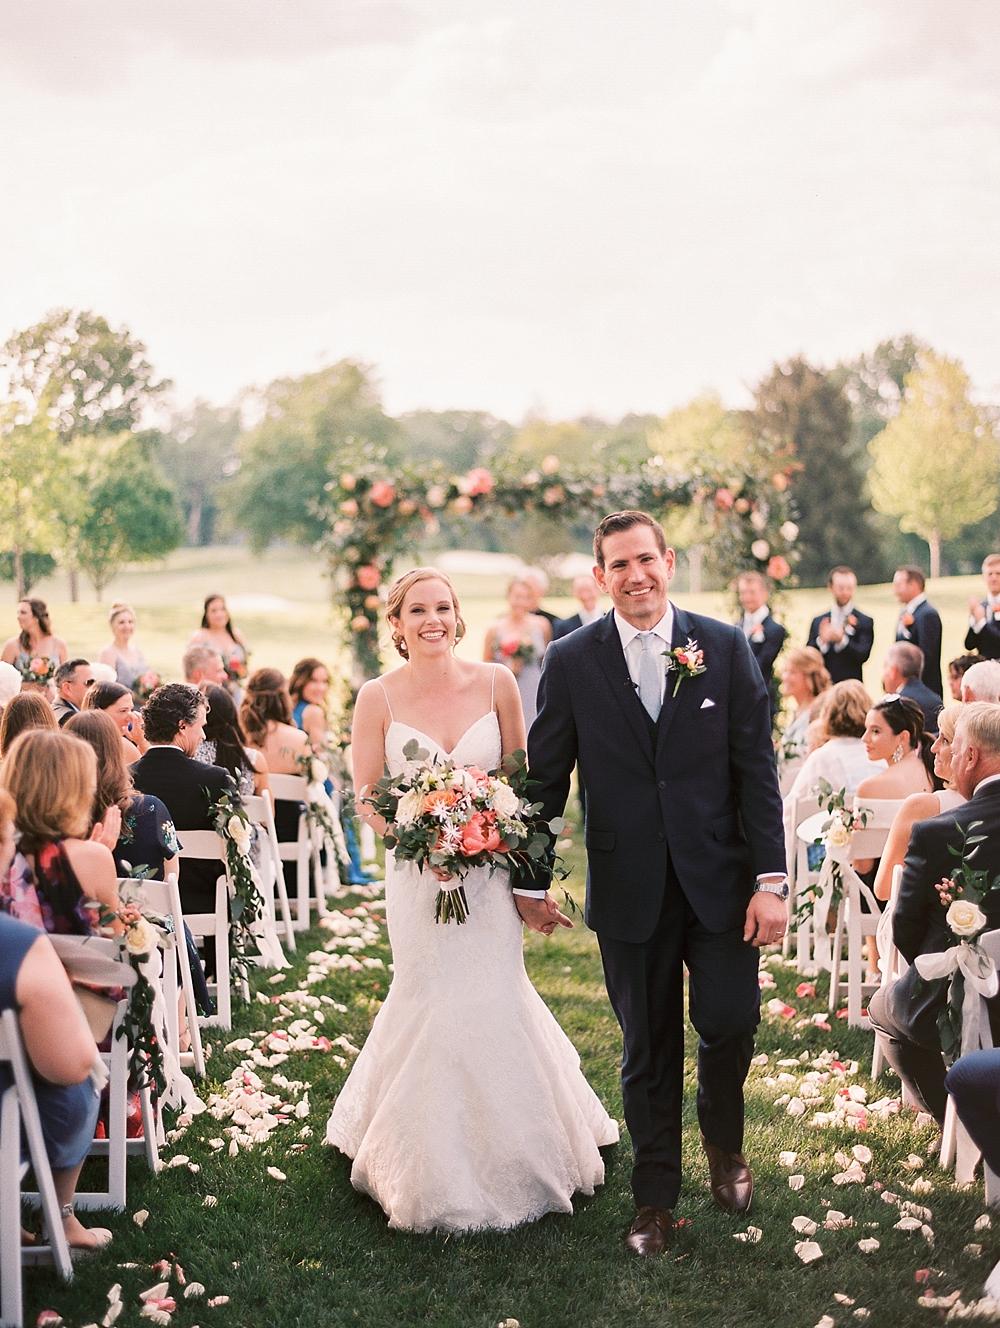 kristin-la-voie-photography-butterfield-country-club-best-chicago-austin-wedding-fine-art-photographer-12